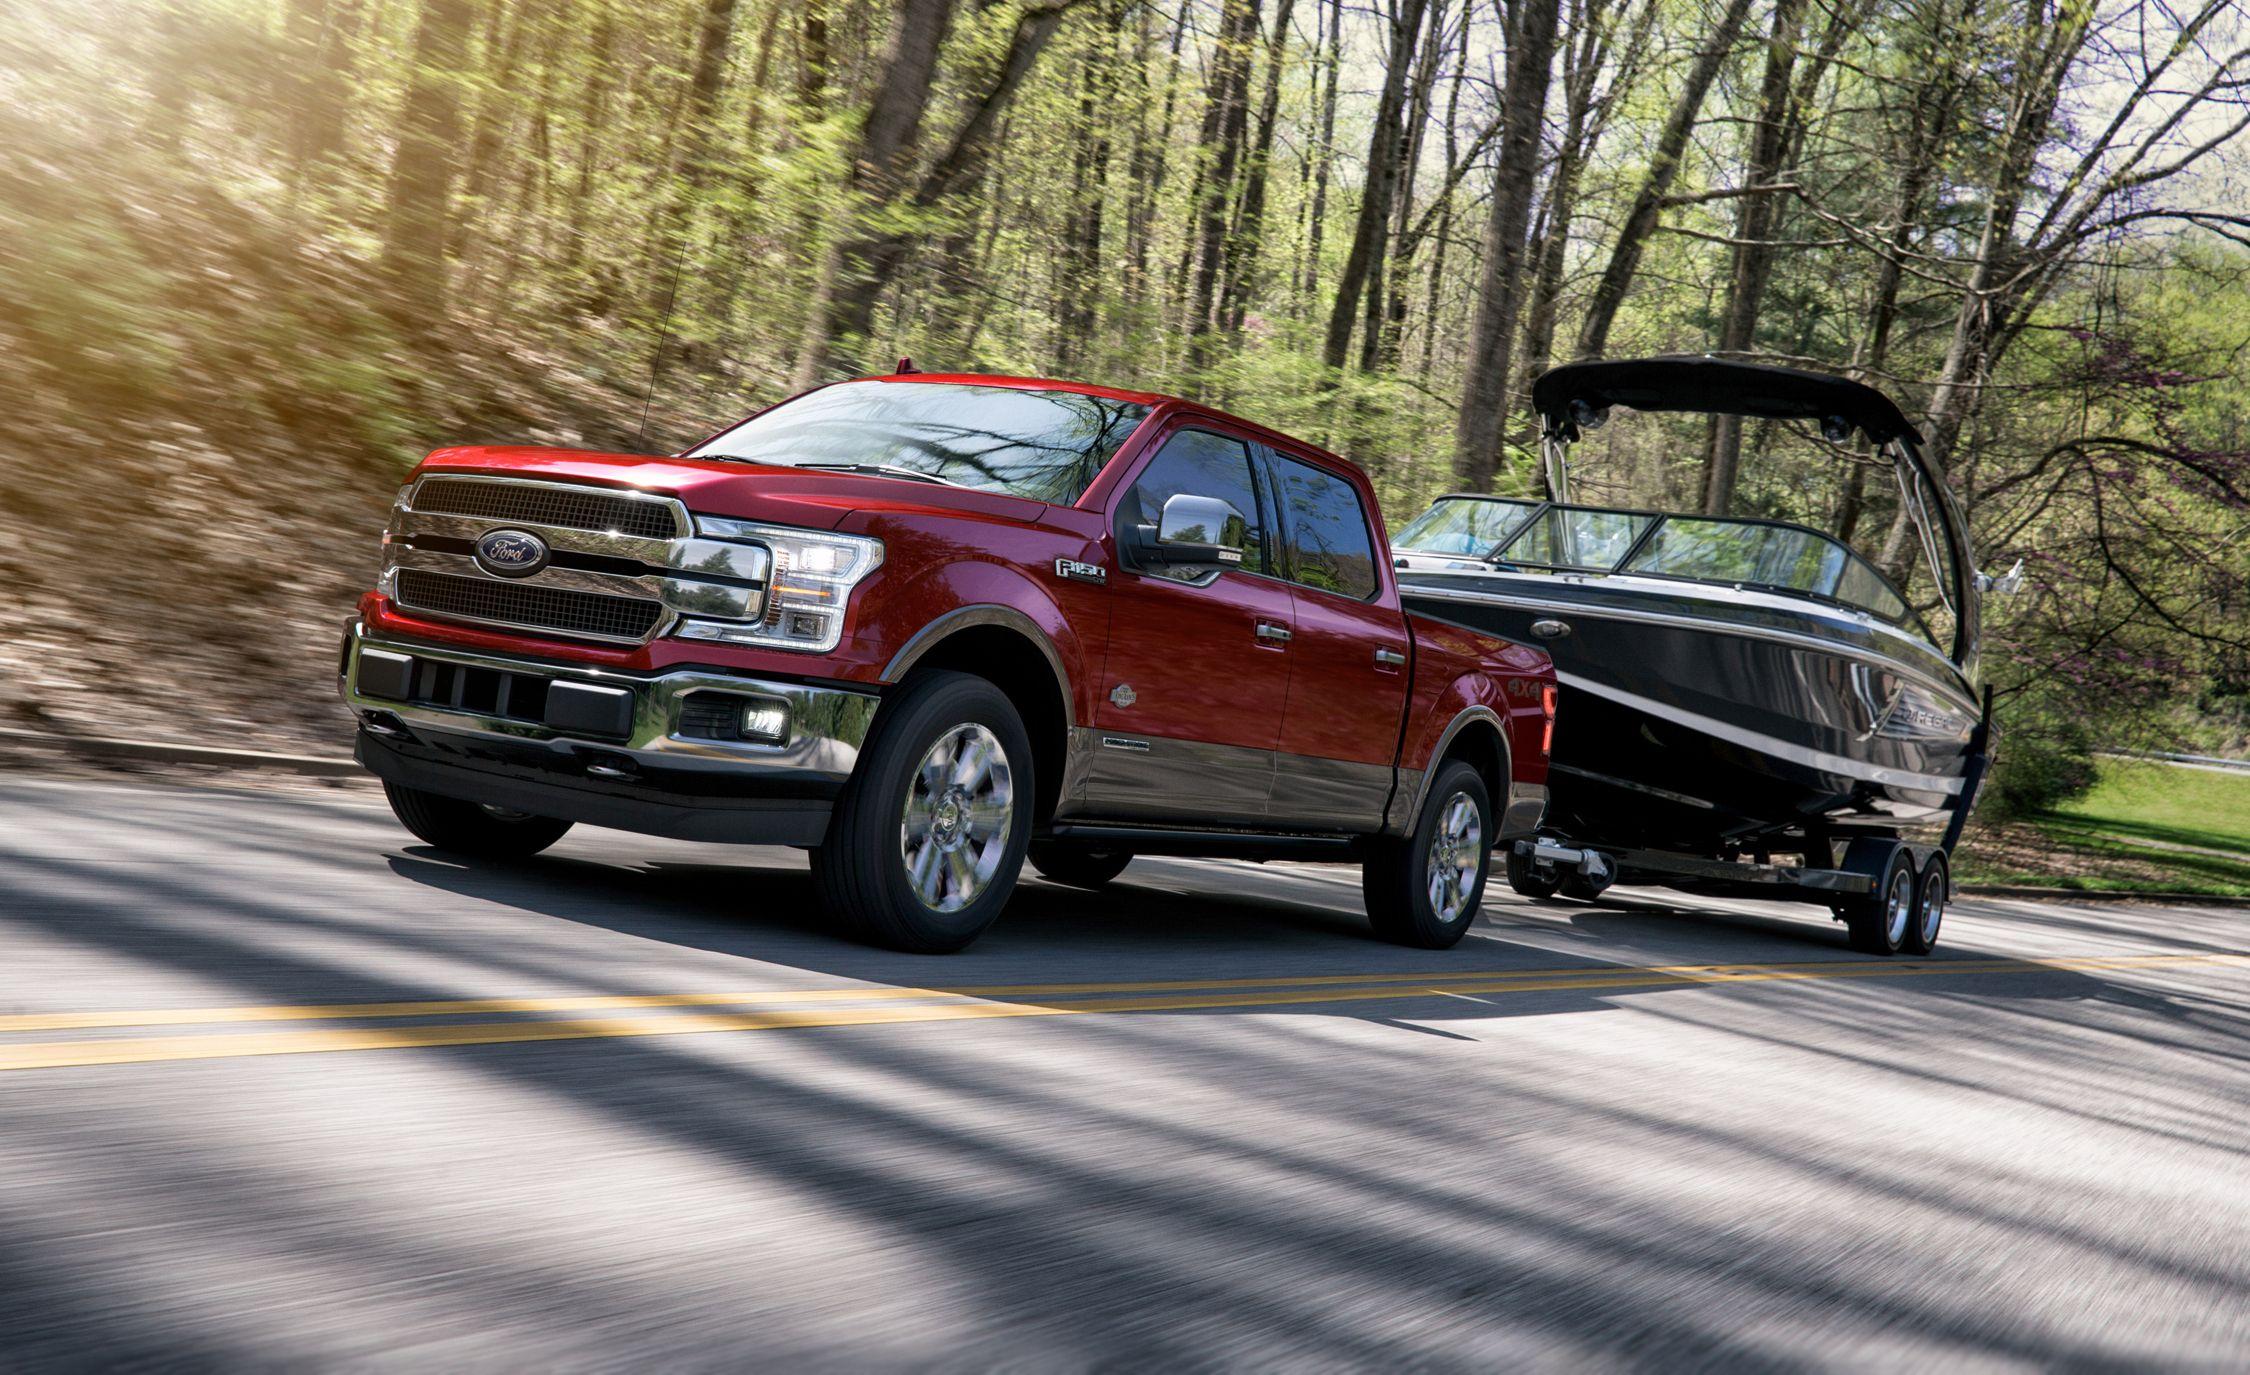 2019 Chevrolet Silverado Priced: Some Models Are Higher ...